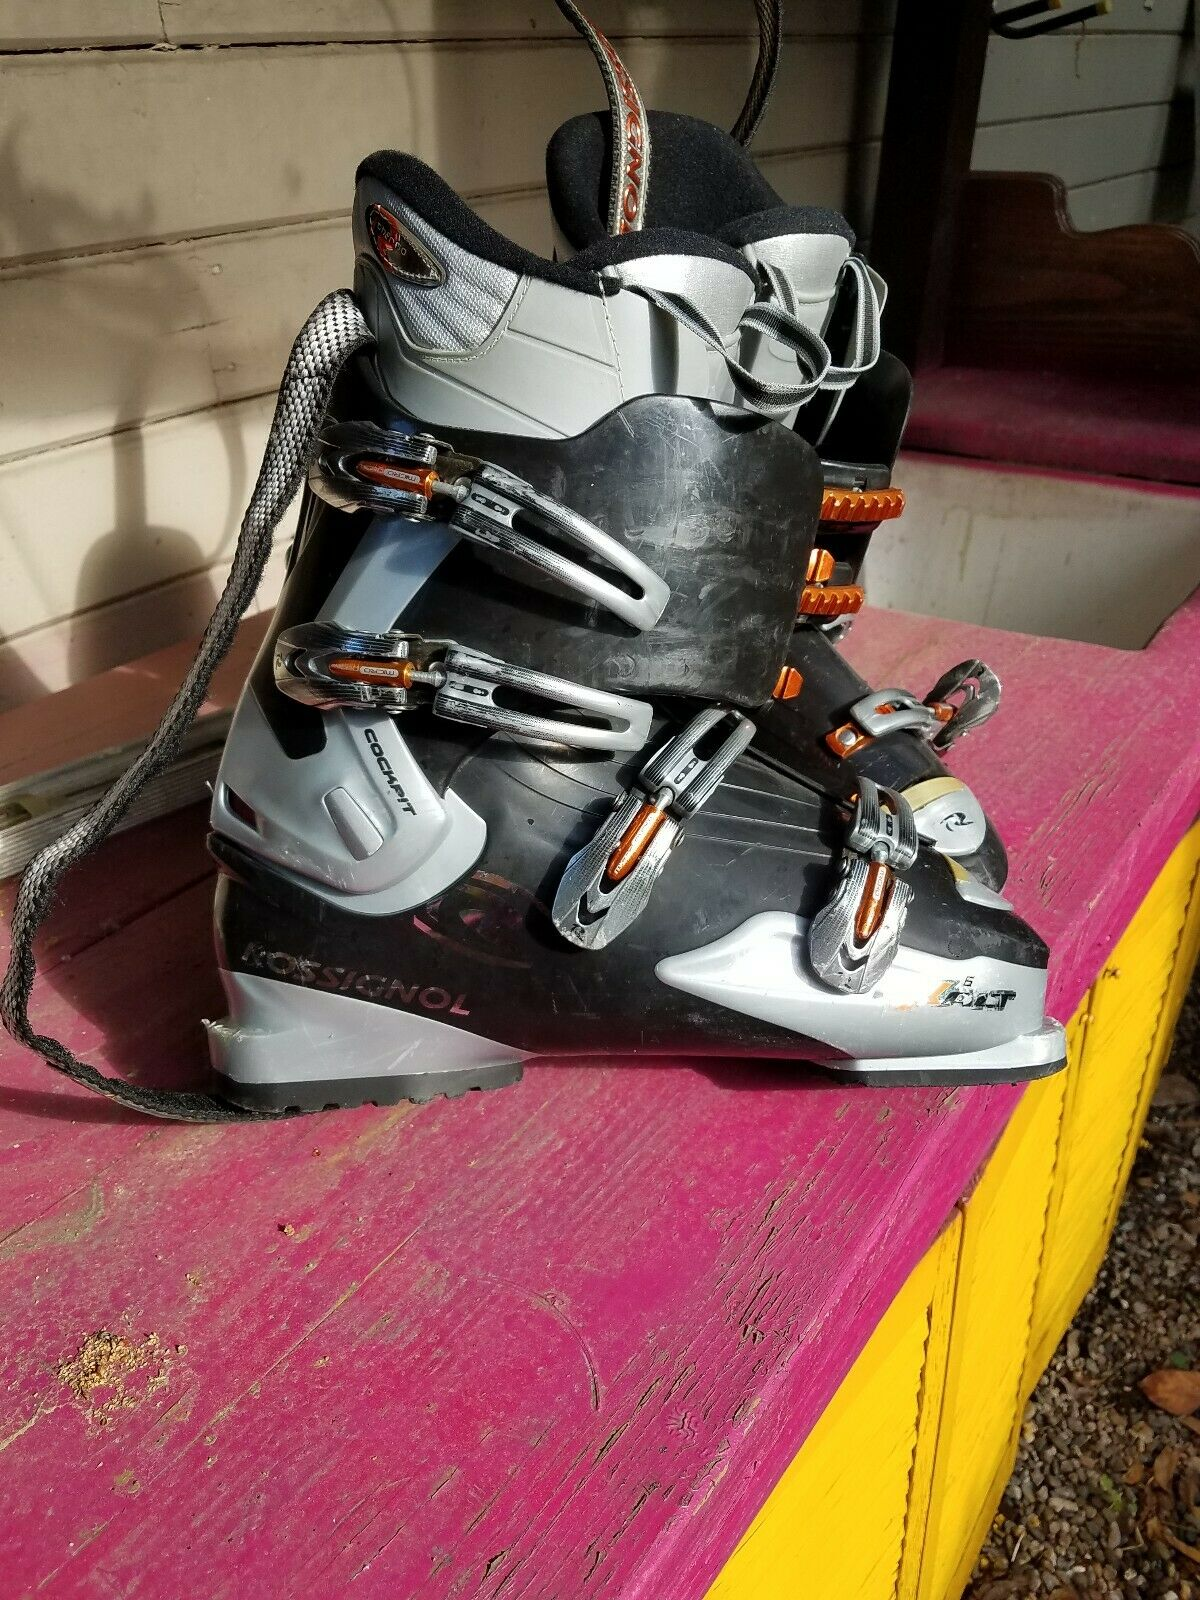 Rossignol Exalt Adult Ski Stiefel - Größe 29.5 Used thermo fit